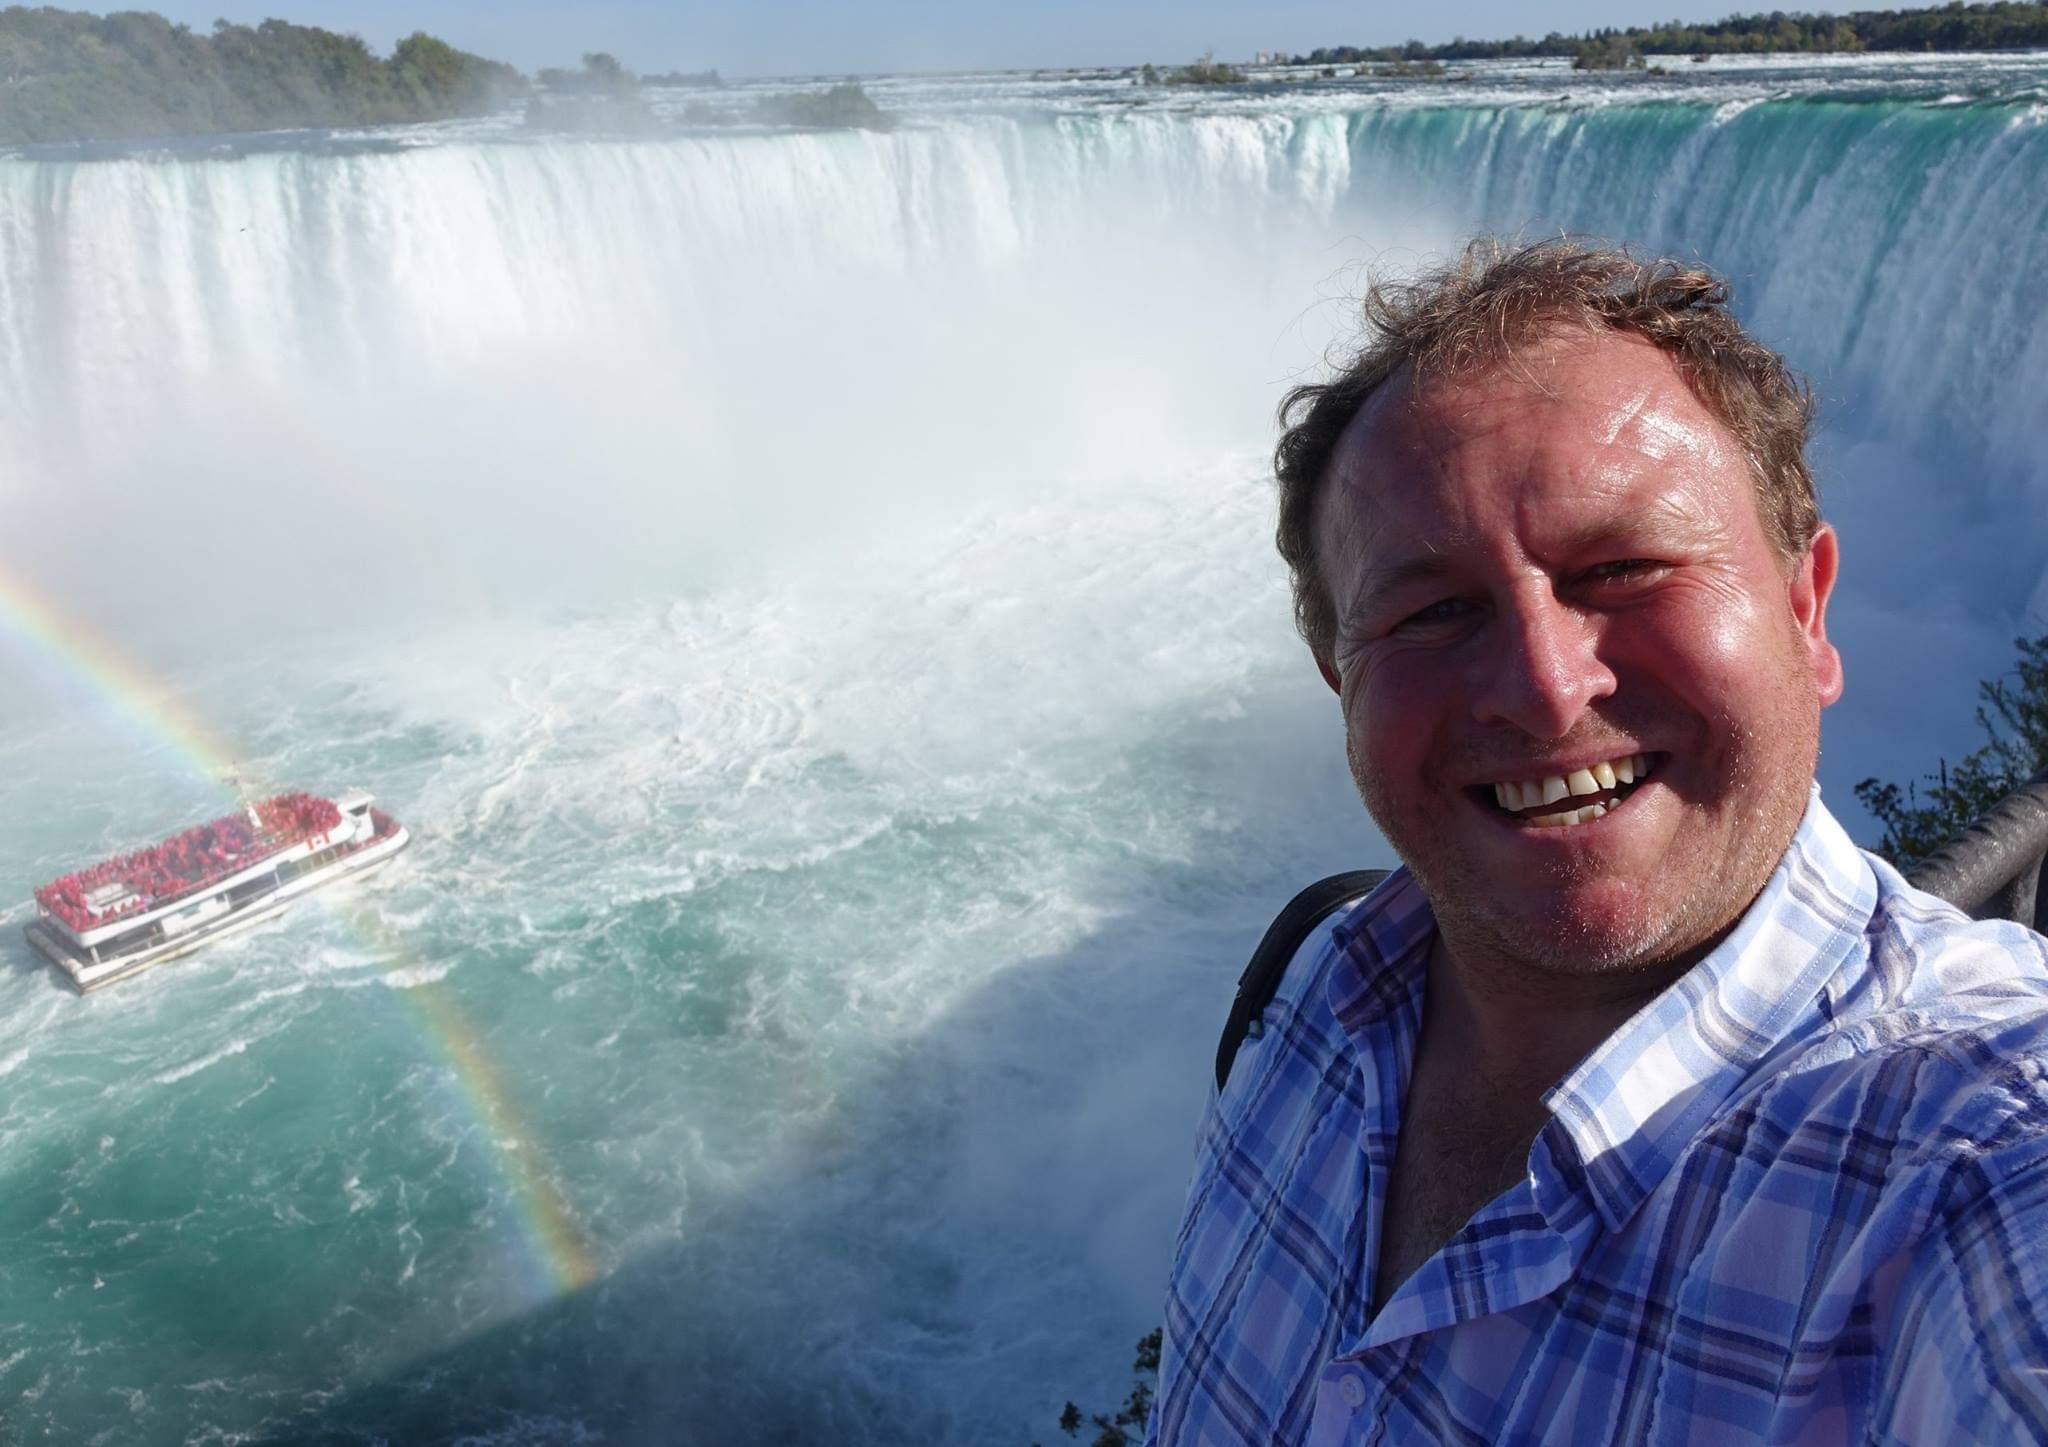 Niagara Falls, Canada. A beautiful day at the impressive Horseshoe Falls